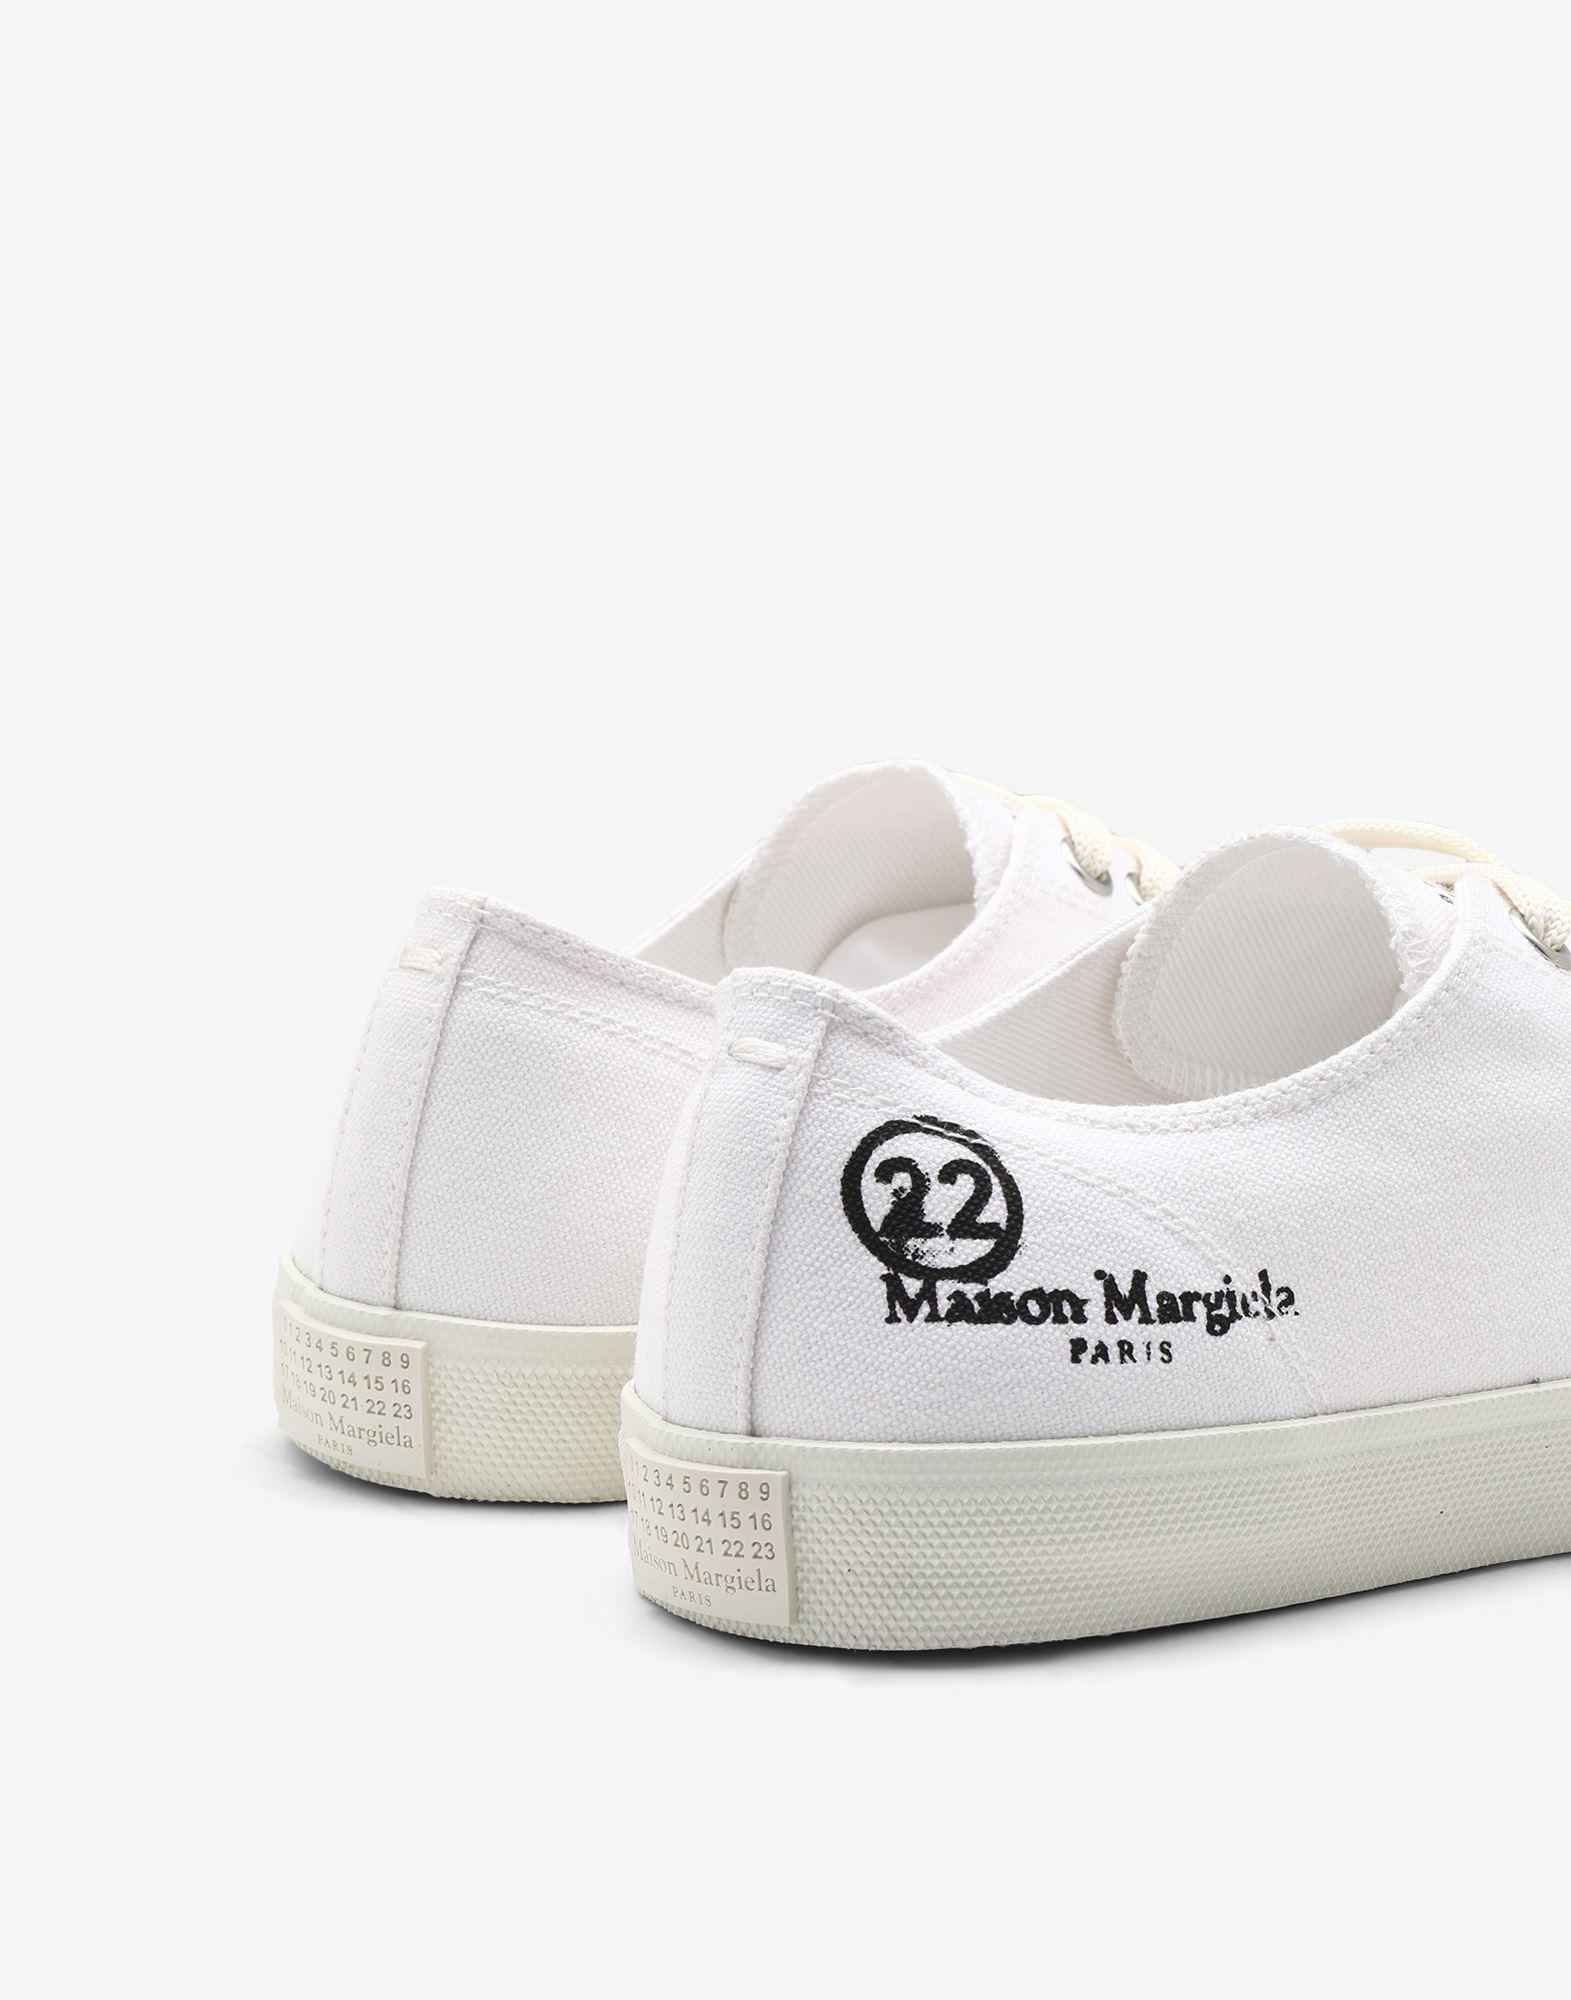 MAISON MARGIELA Sneakers Tabi in tela Sneakers Tabi Donna e